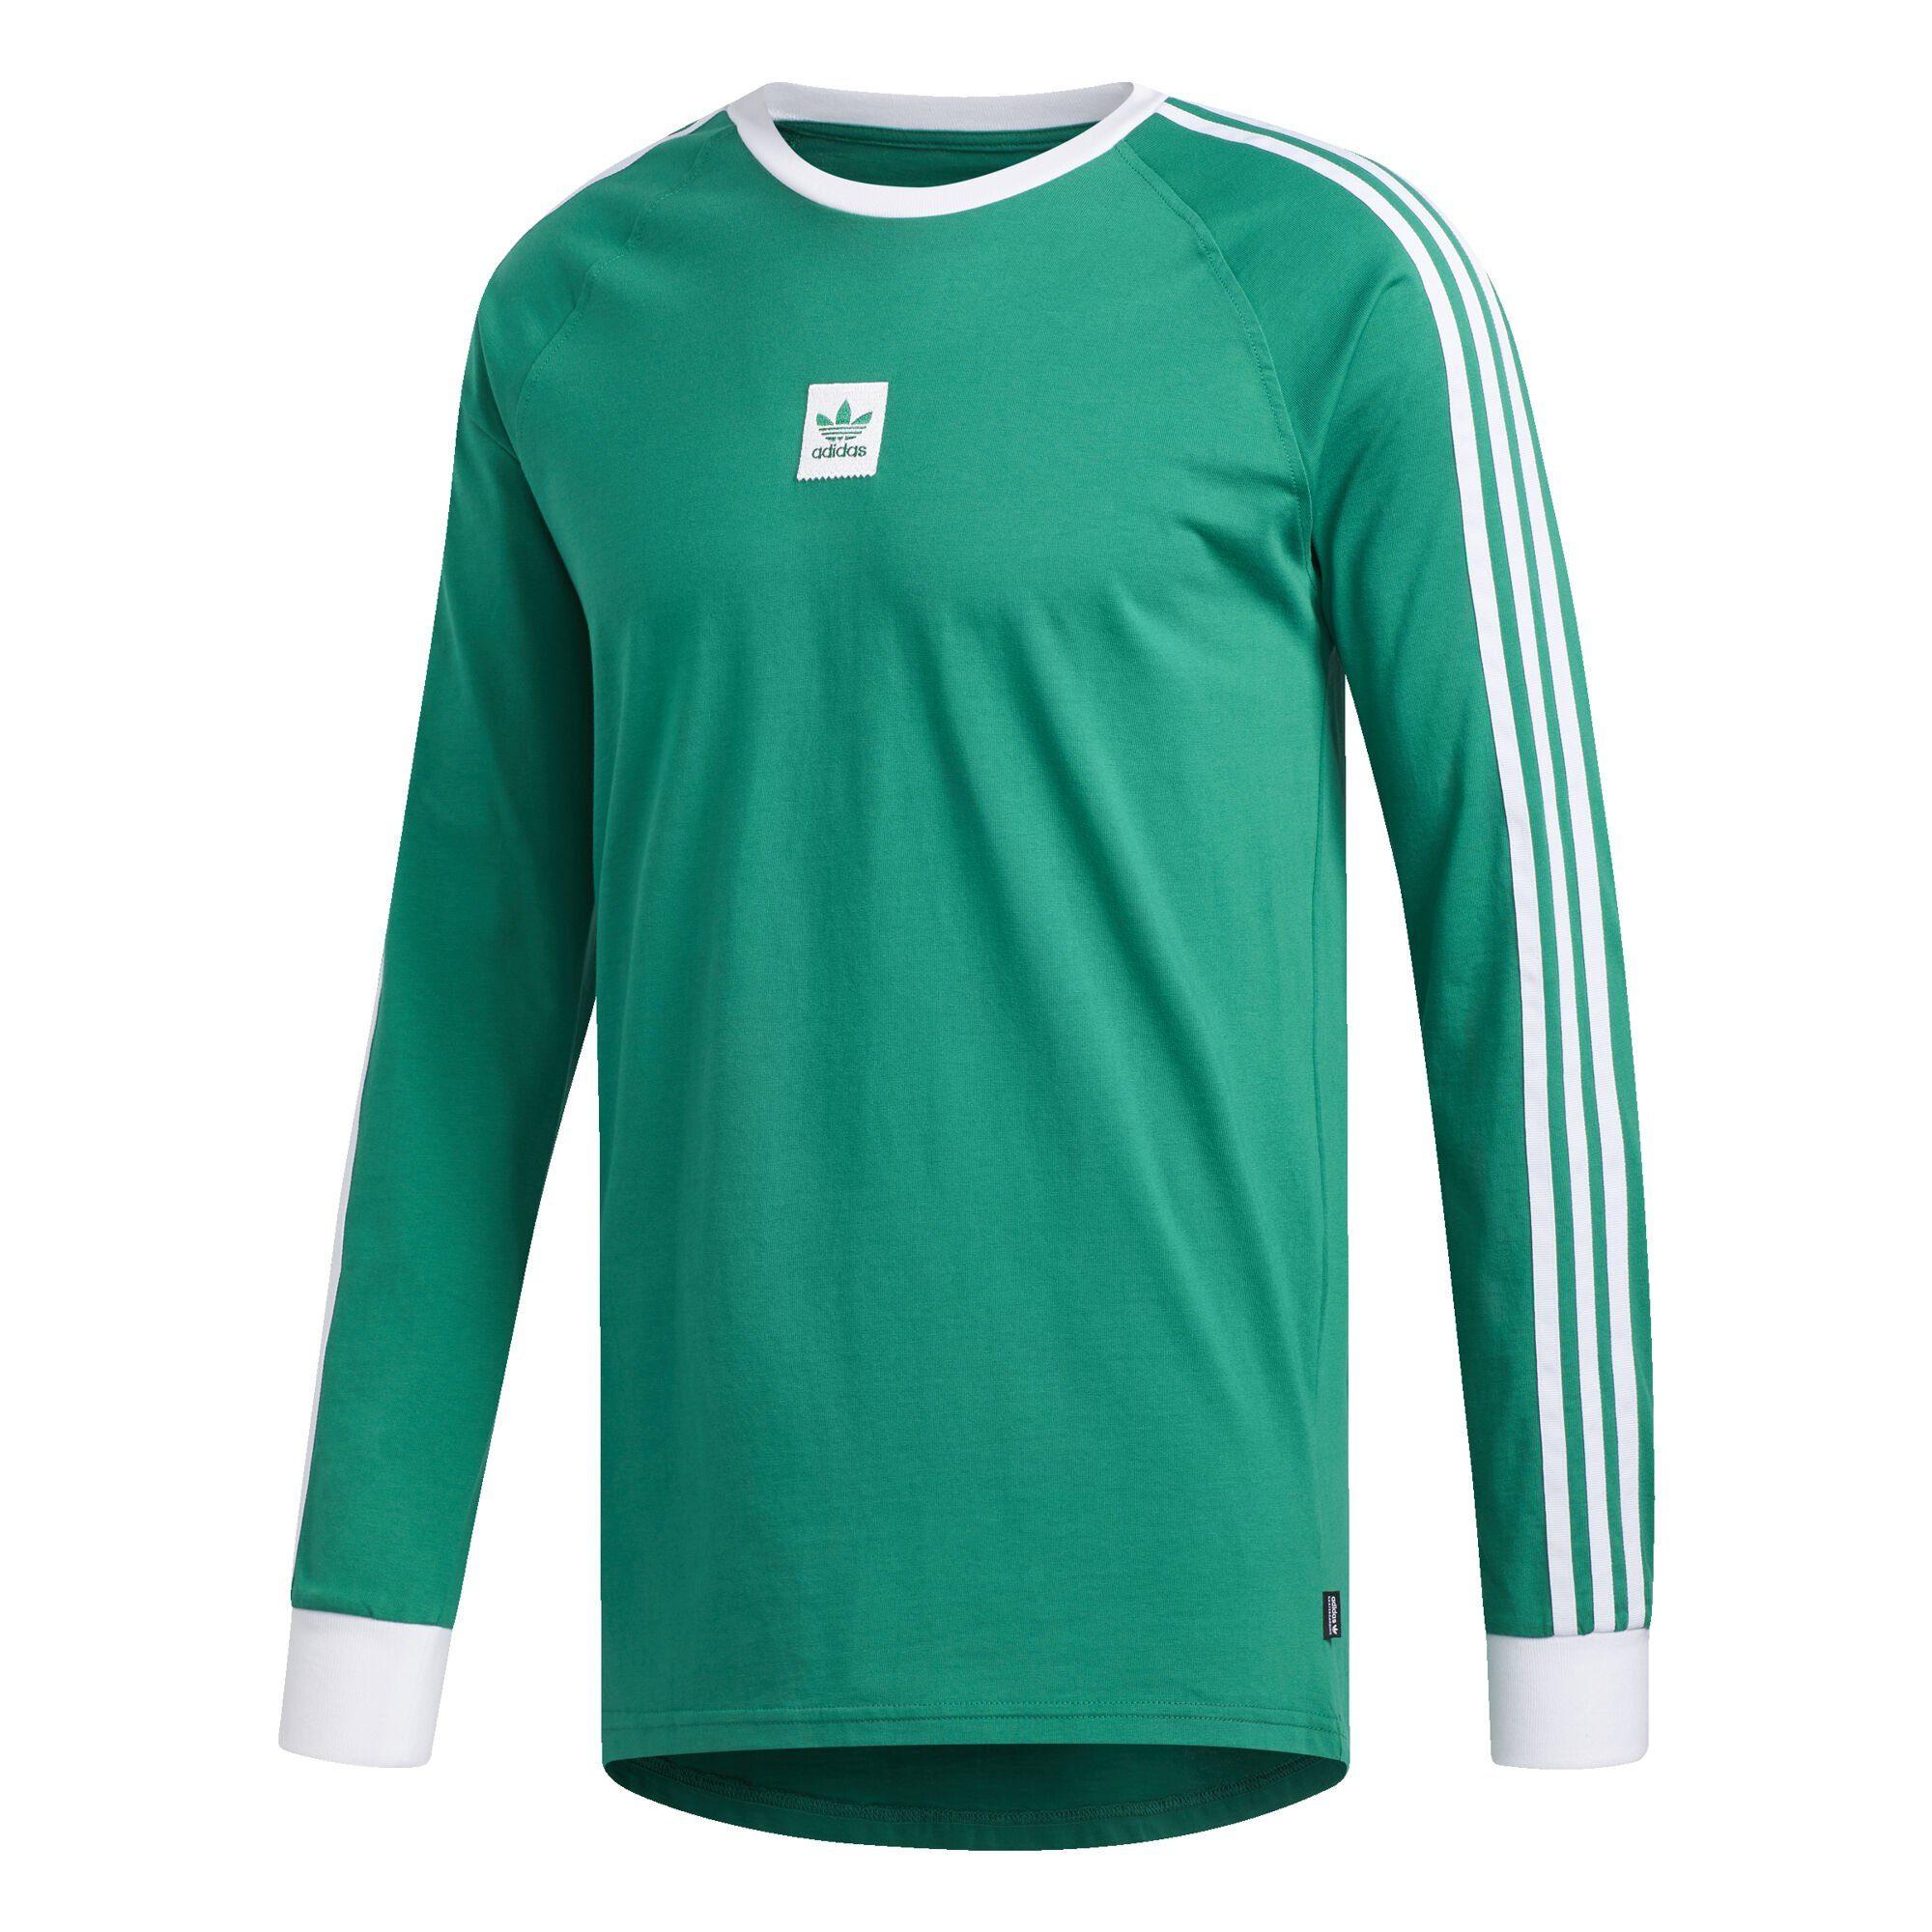 adidas Damen Originals T Shirt Graphic Tee Beach Trefoil